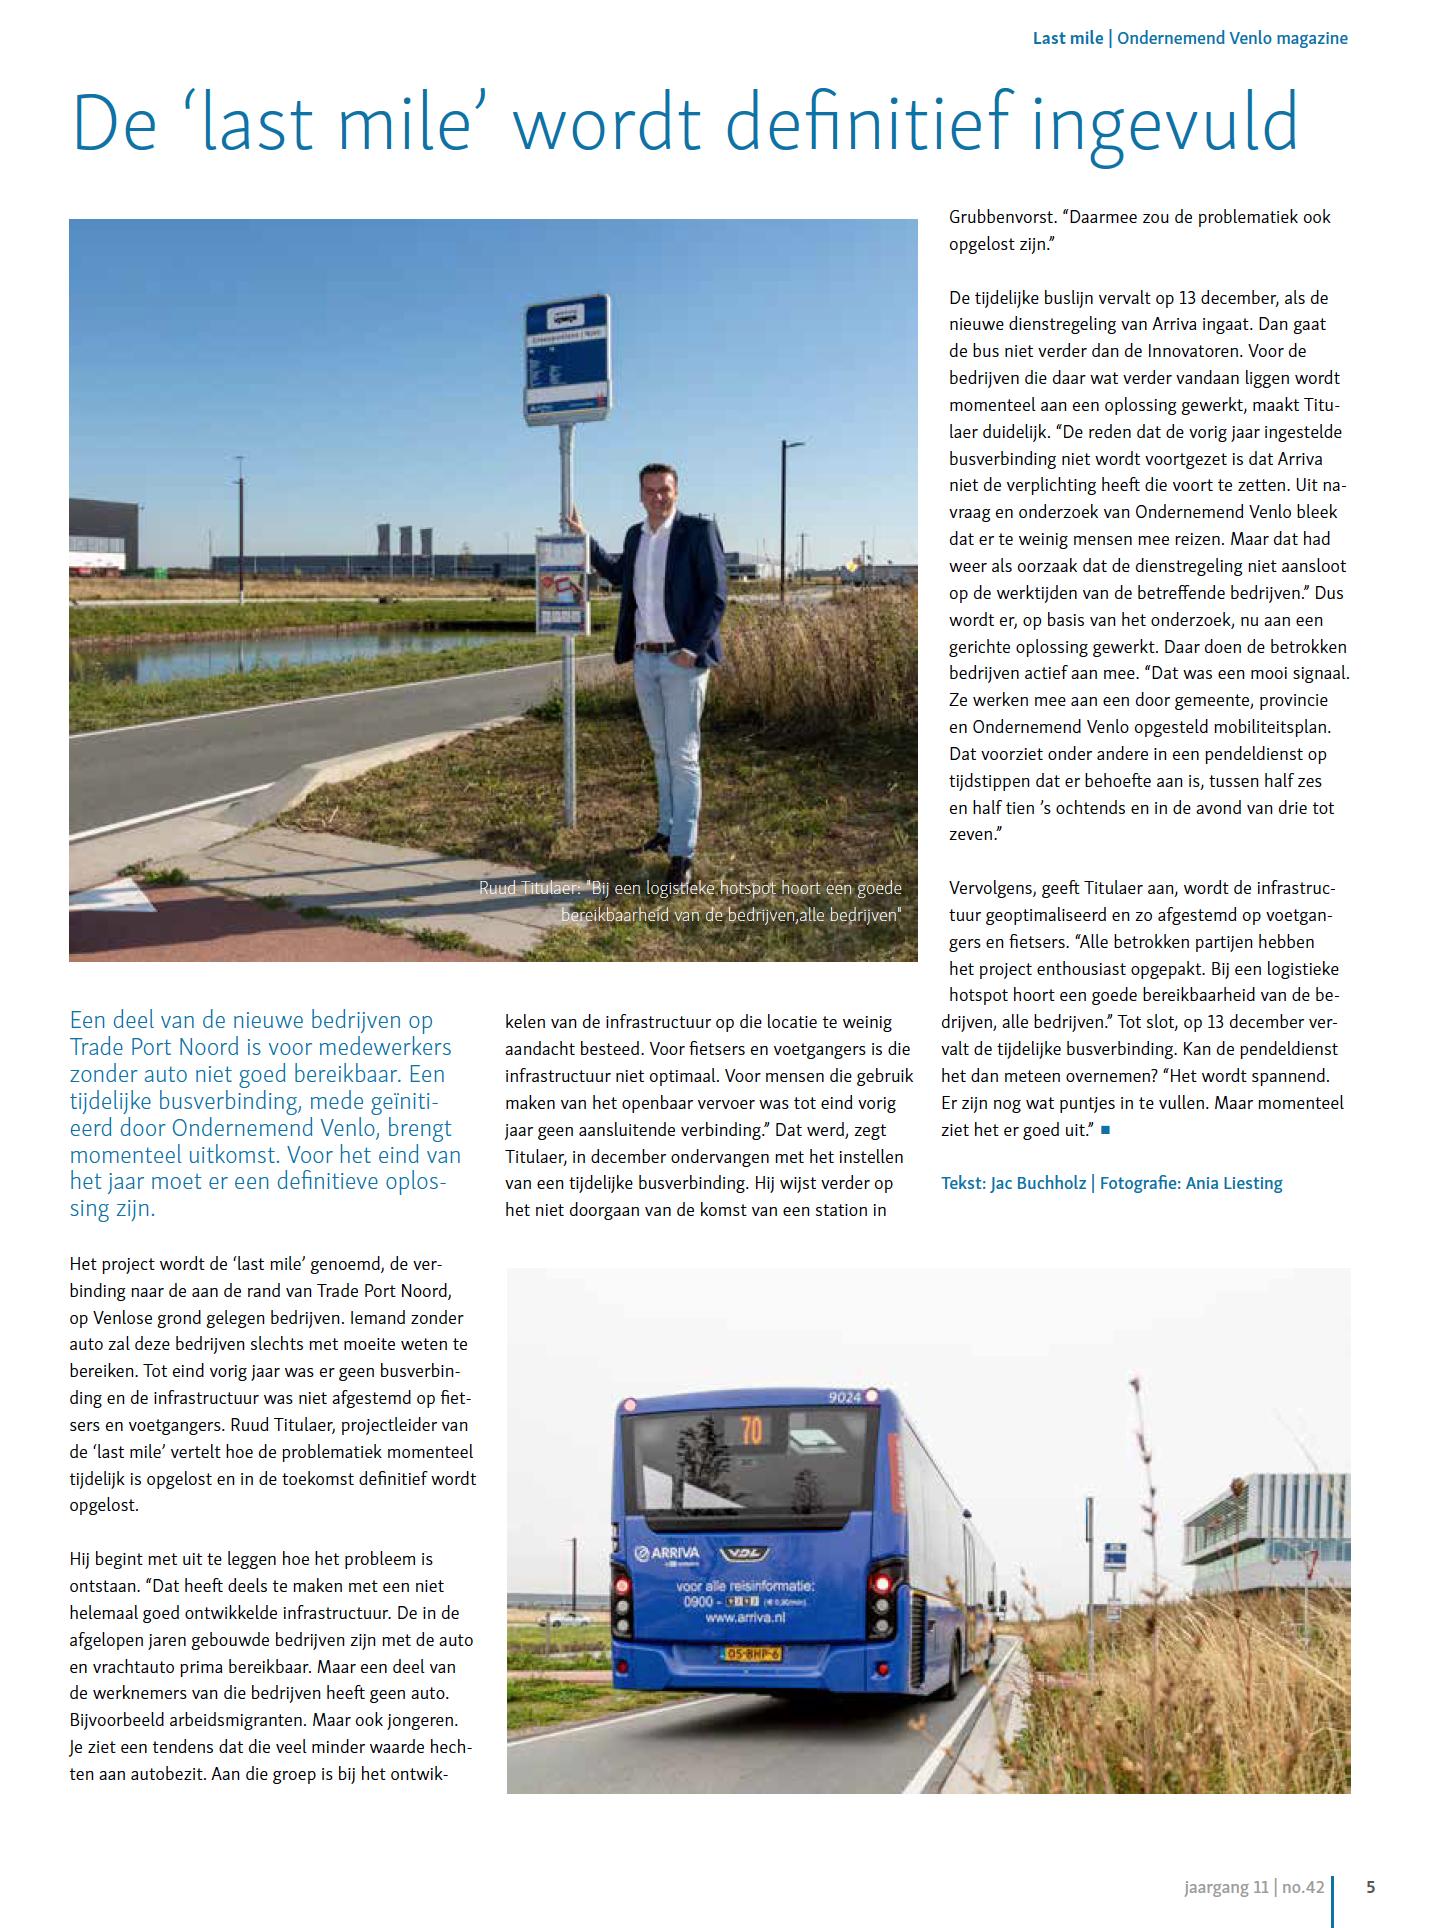 Ondernemend Venlo Magazine